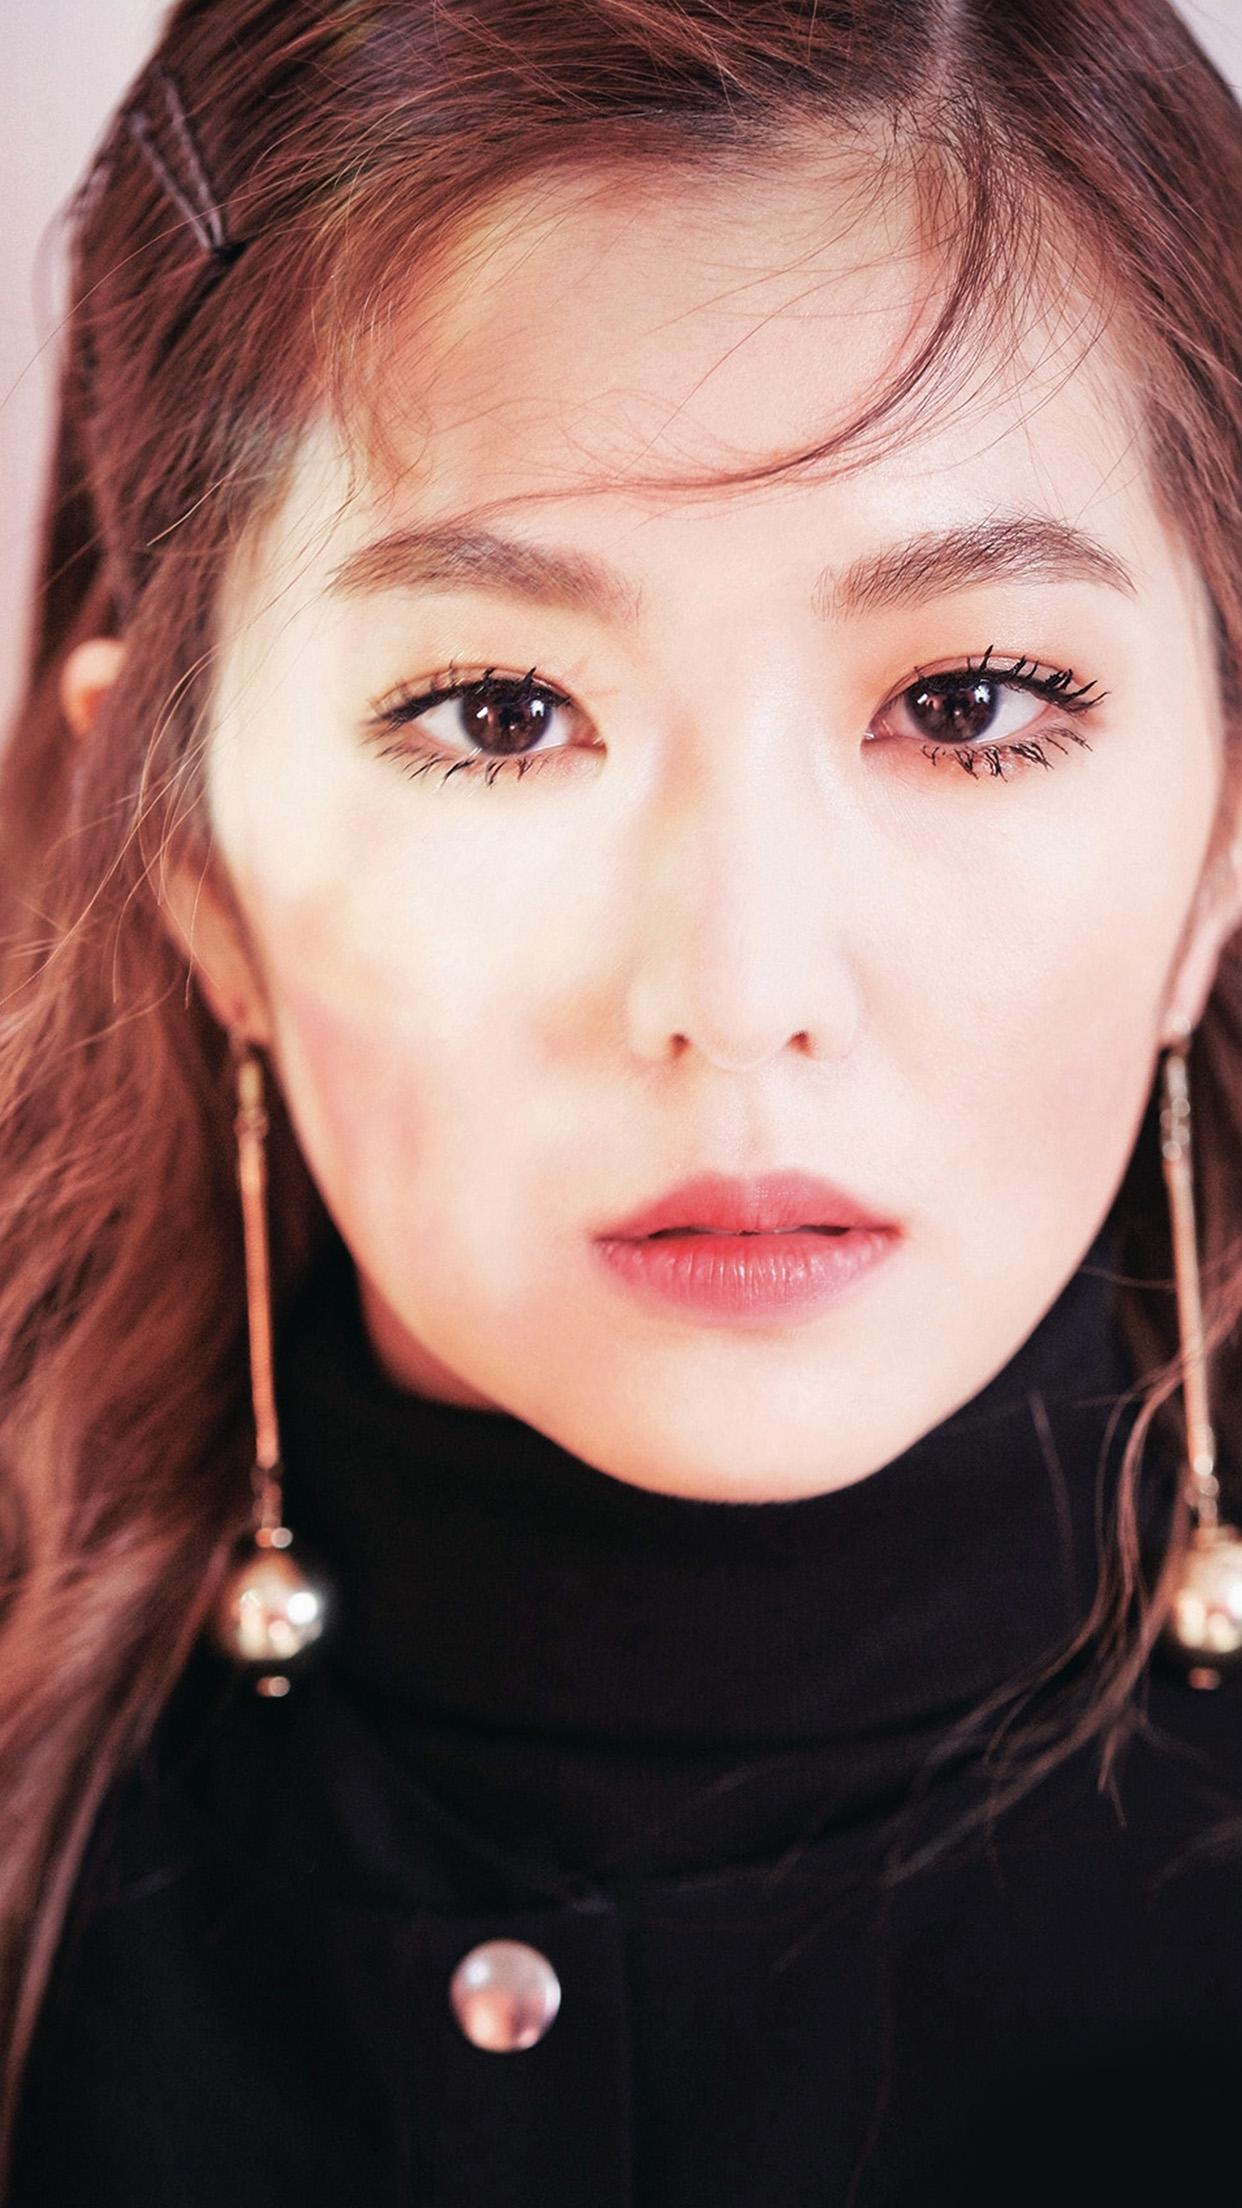 Papers Co Iphone Wallpaper Hi23 Kpop Girl Face Cute